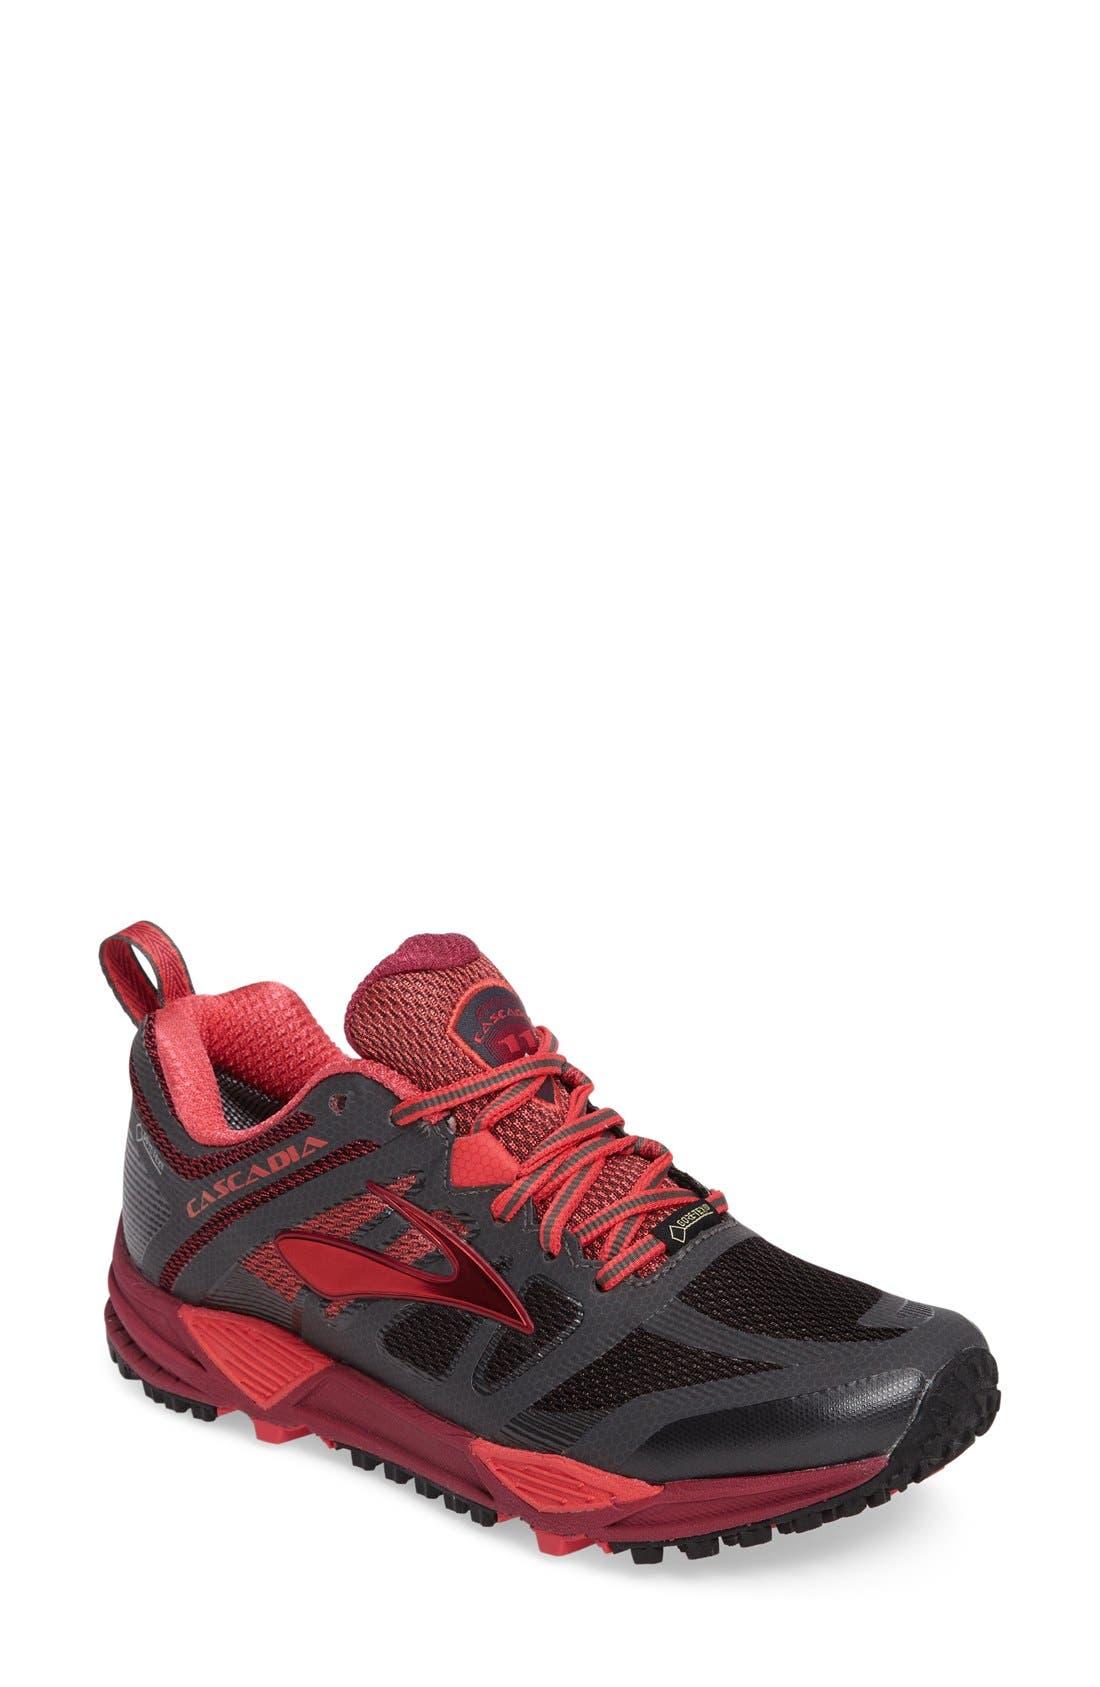 Alternate Image 1 Selected - Brooks Cascadia 11 GTX Trail Running Shoe (Women)